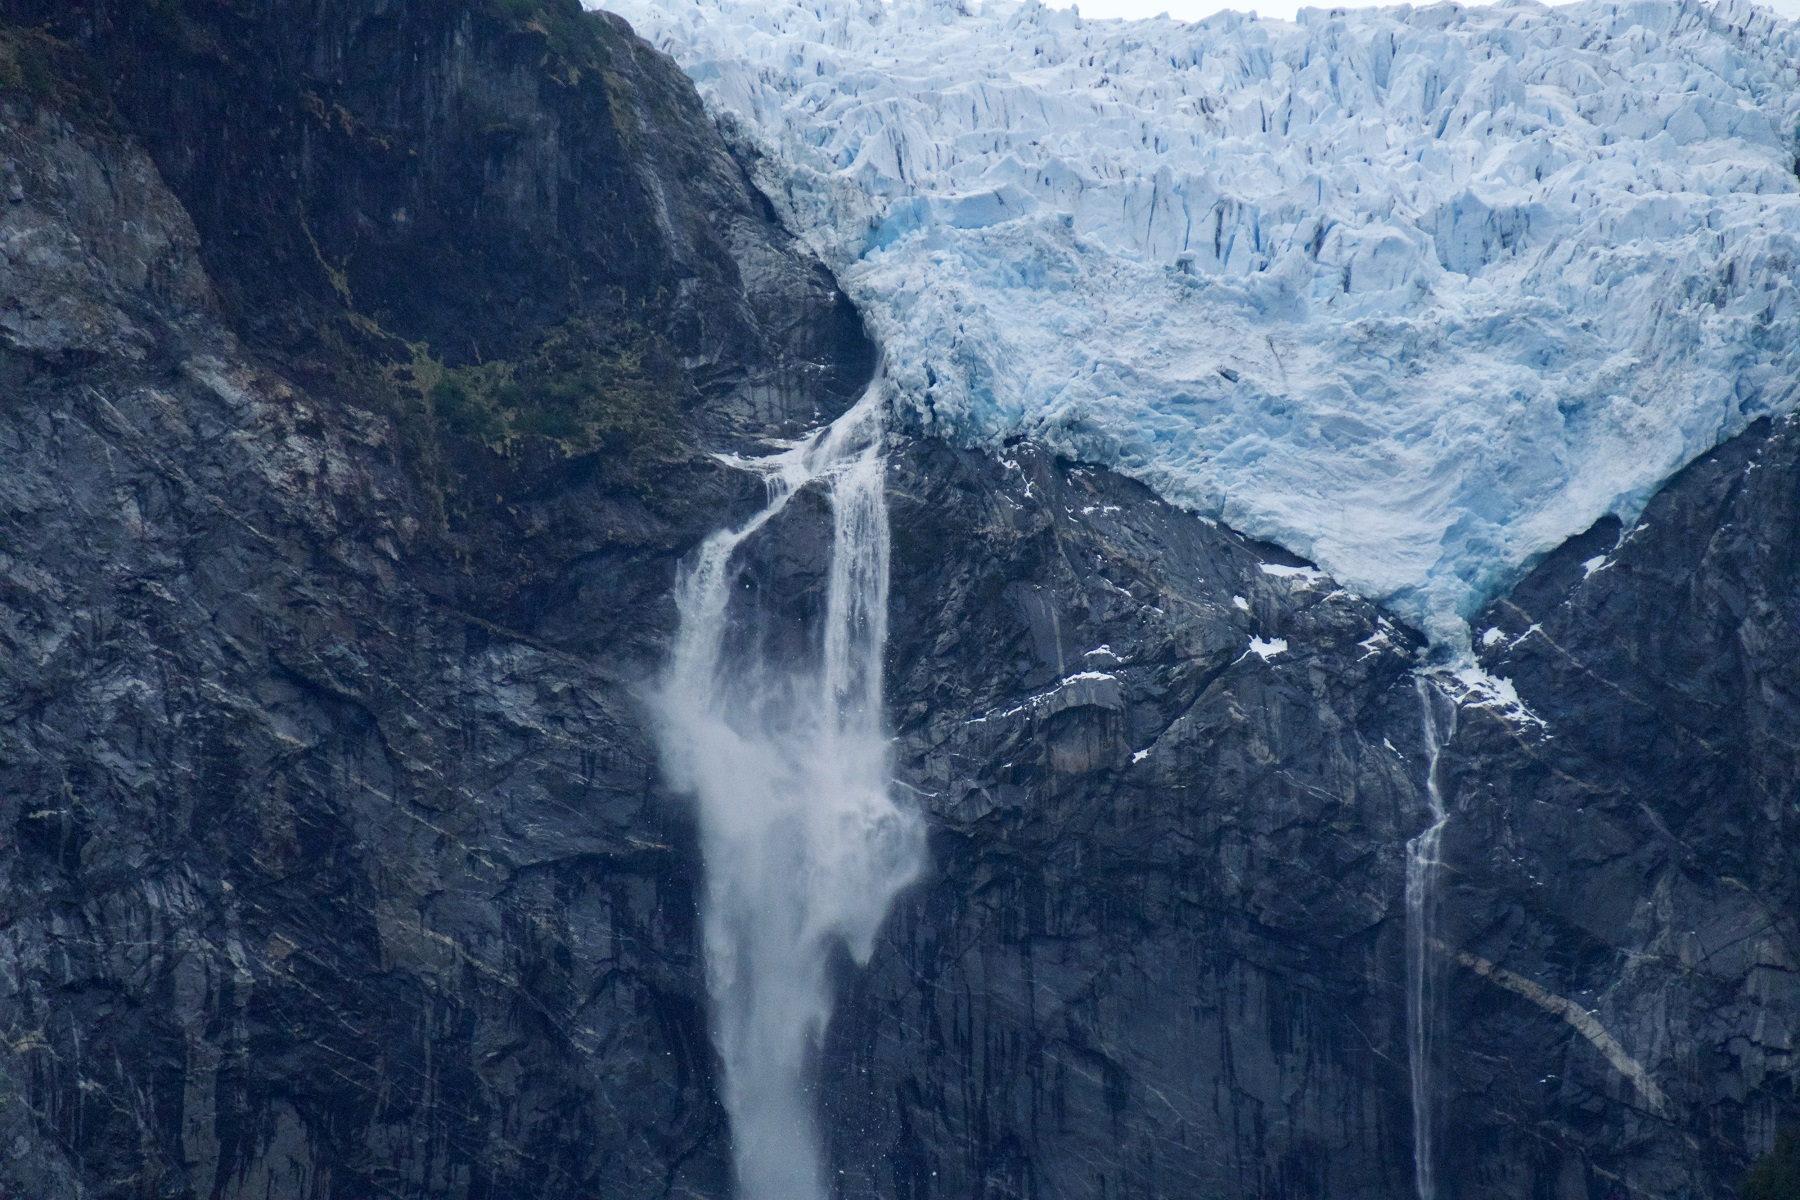 The hanging glacier of Queulat